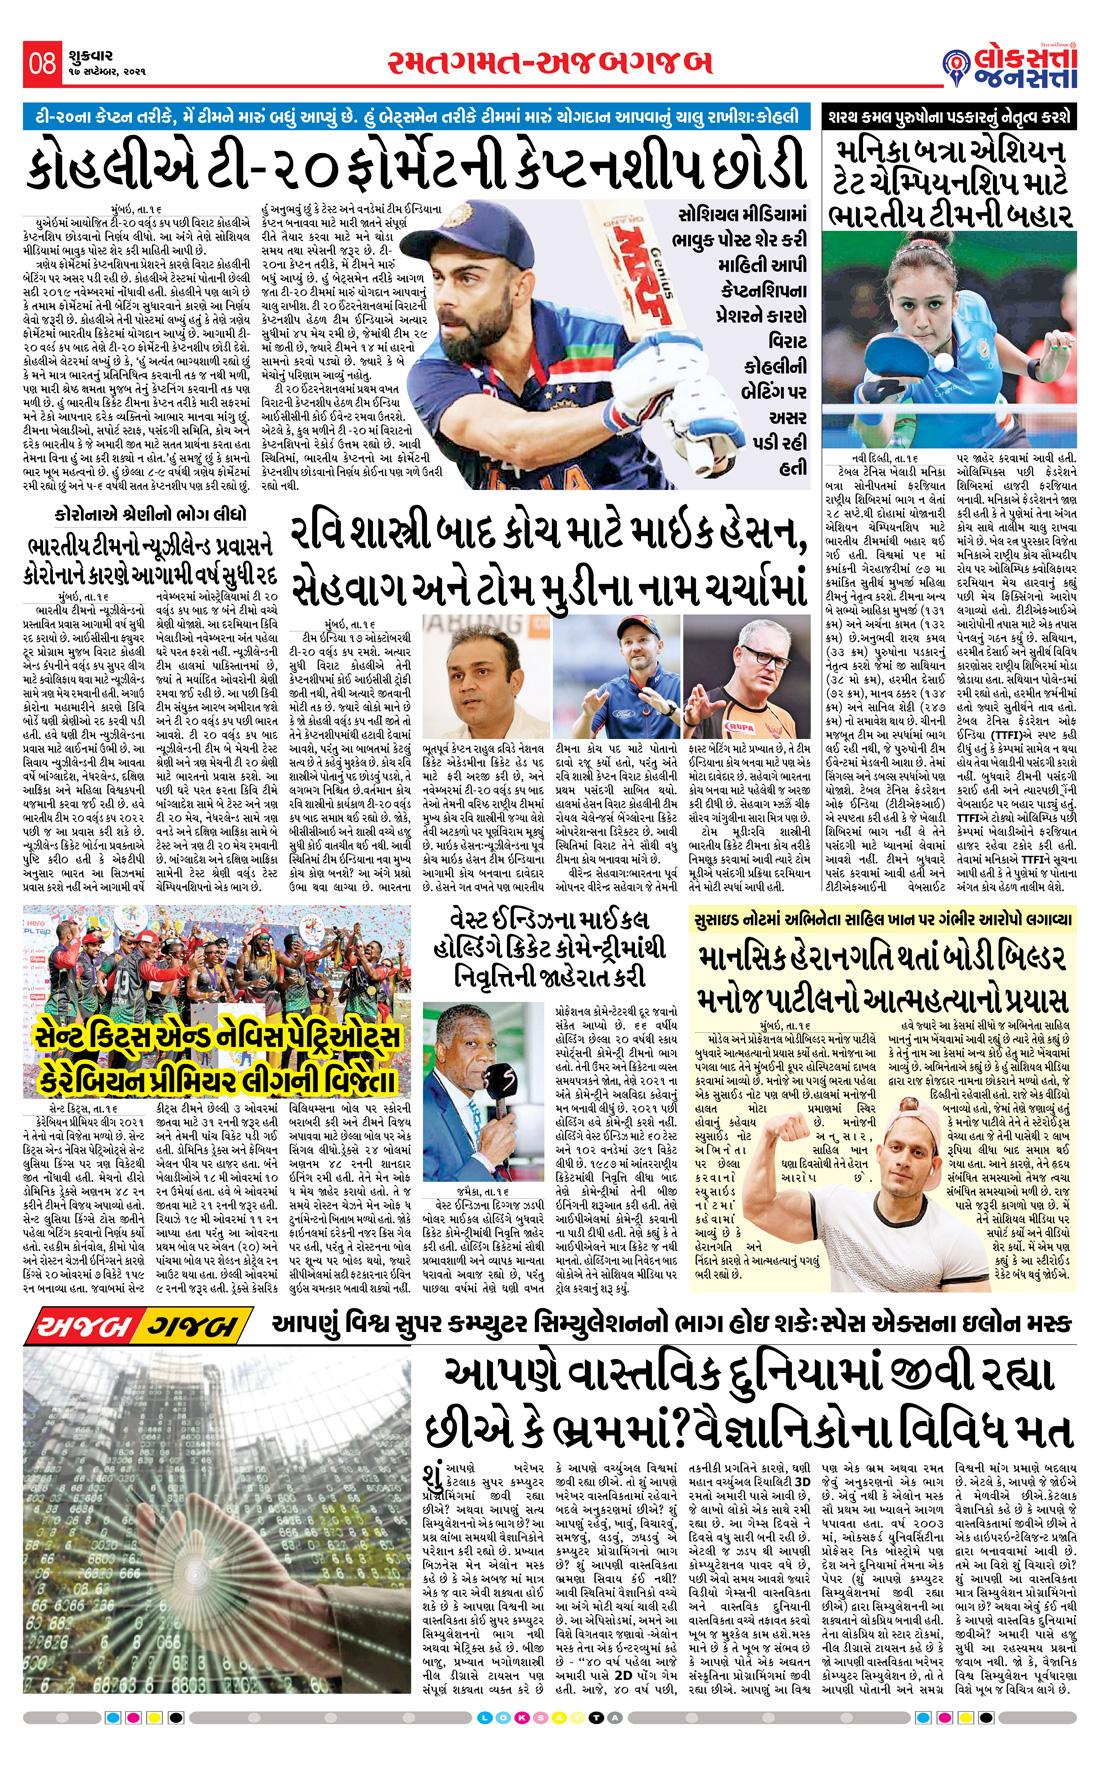 Loksatta Jansatta News Papaer E-paper dated 2021-09-17   Page 8